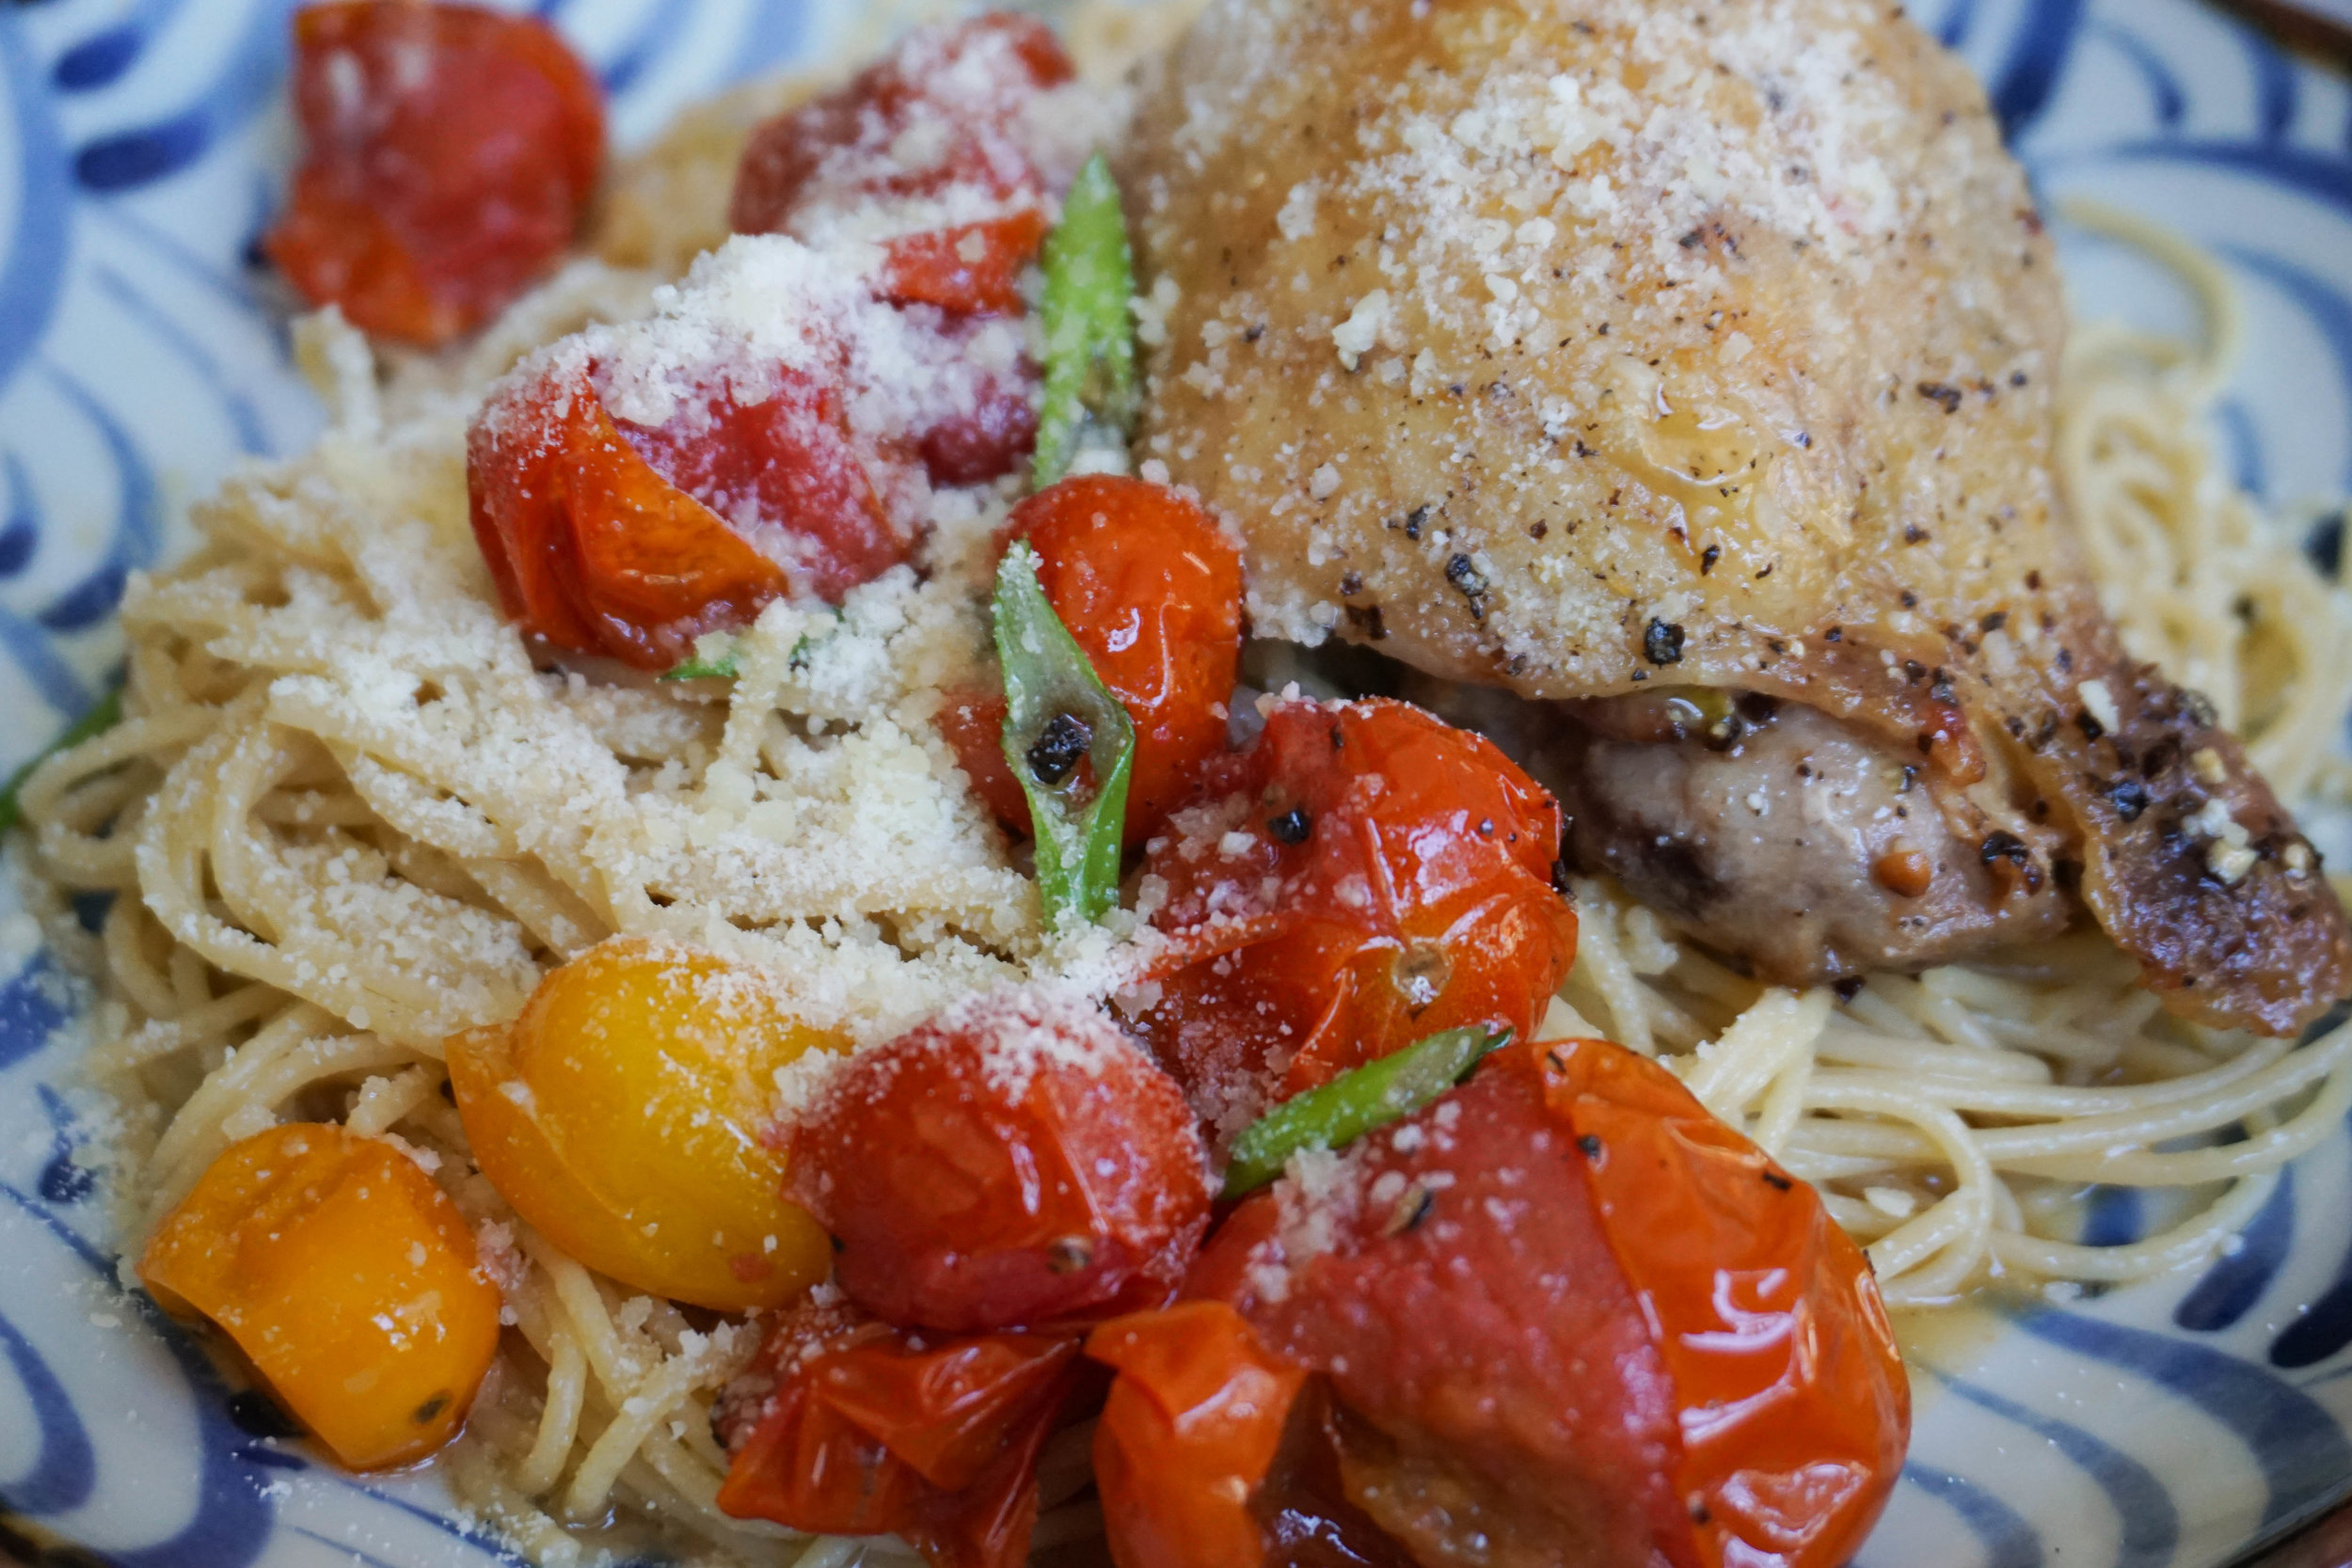 Adding parmesan makes it even better